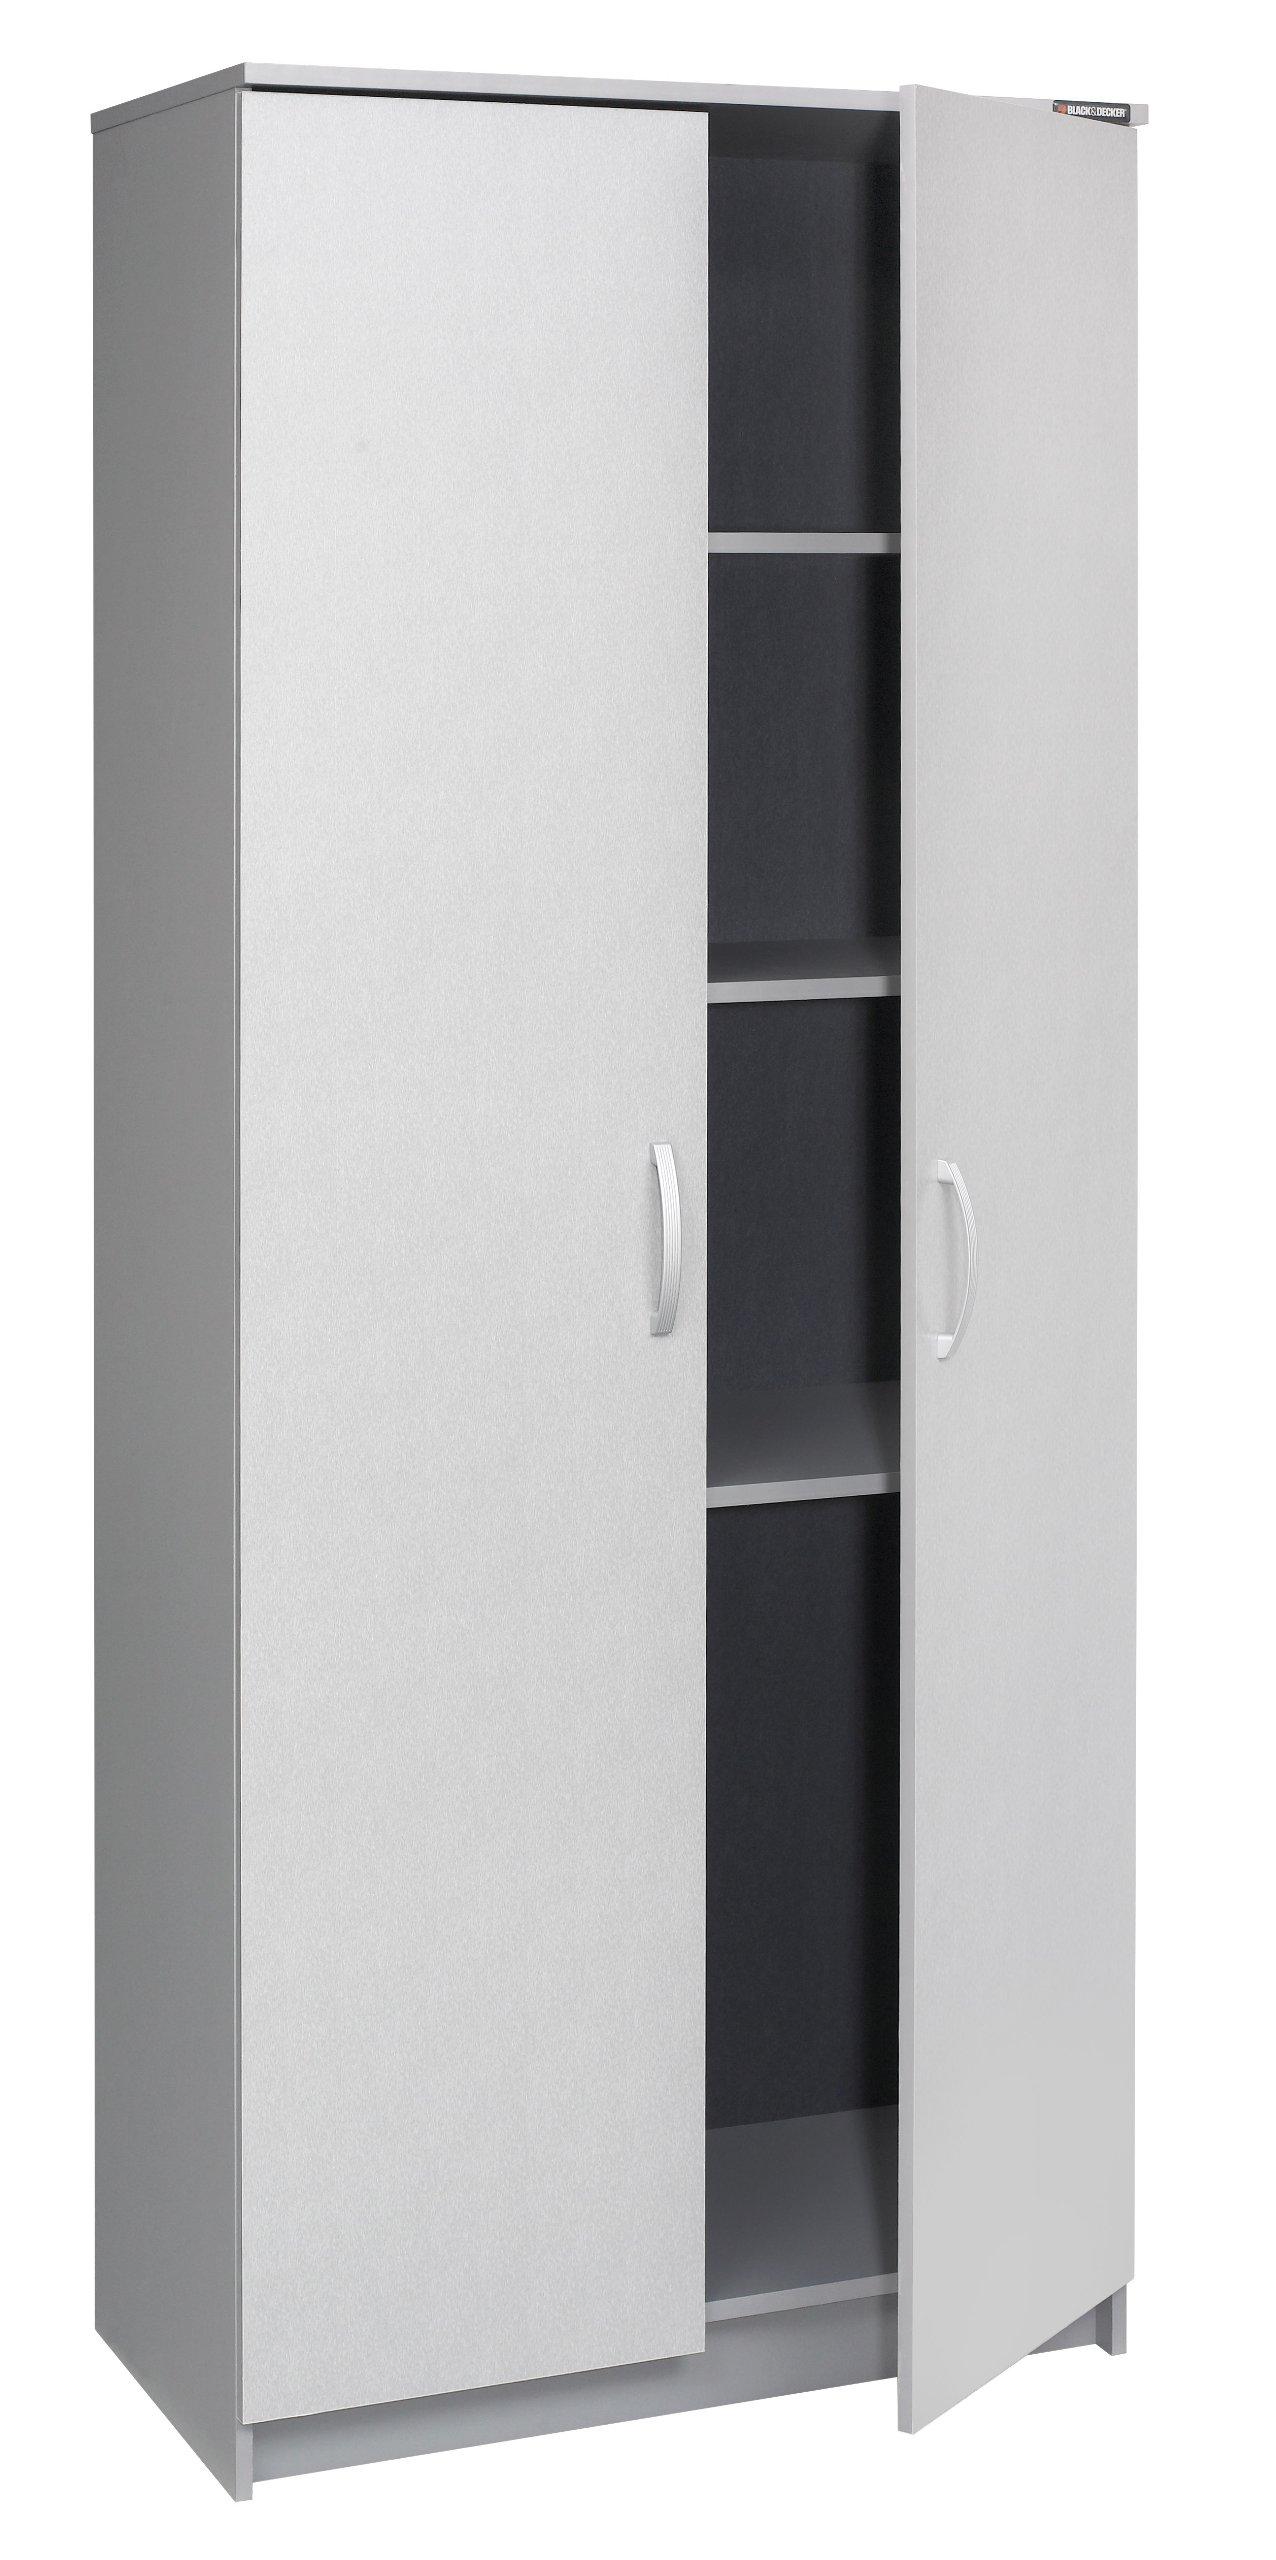 Black & Decker BG106164S 2 Door Storage Cabinet